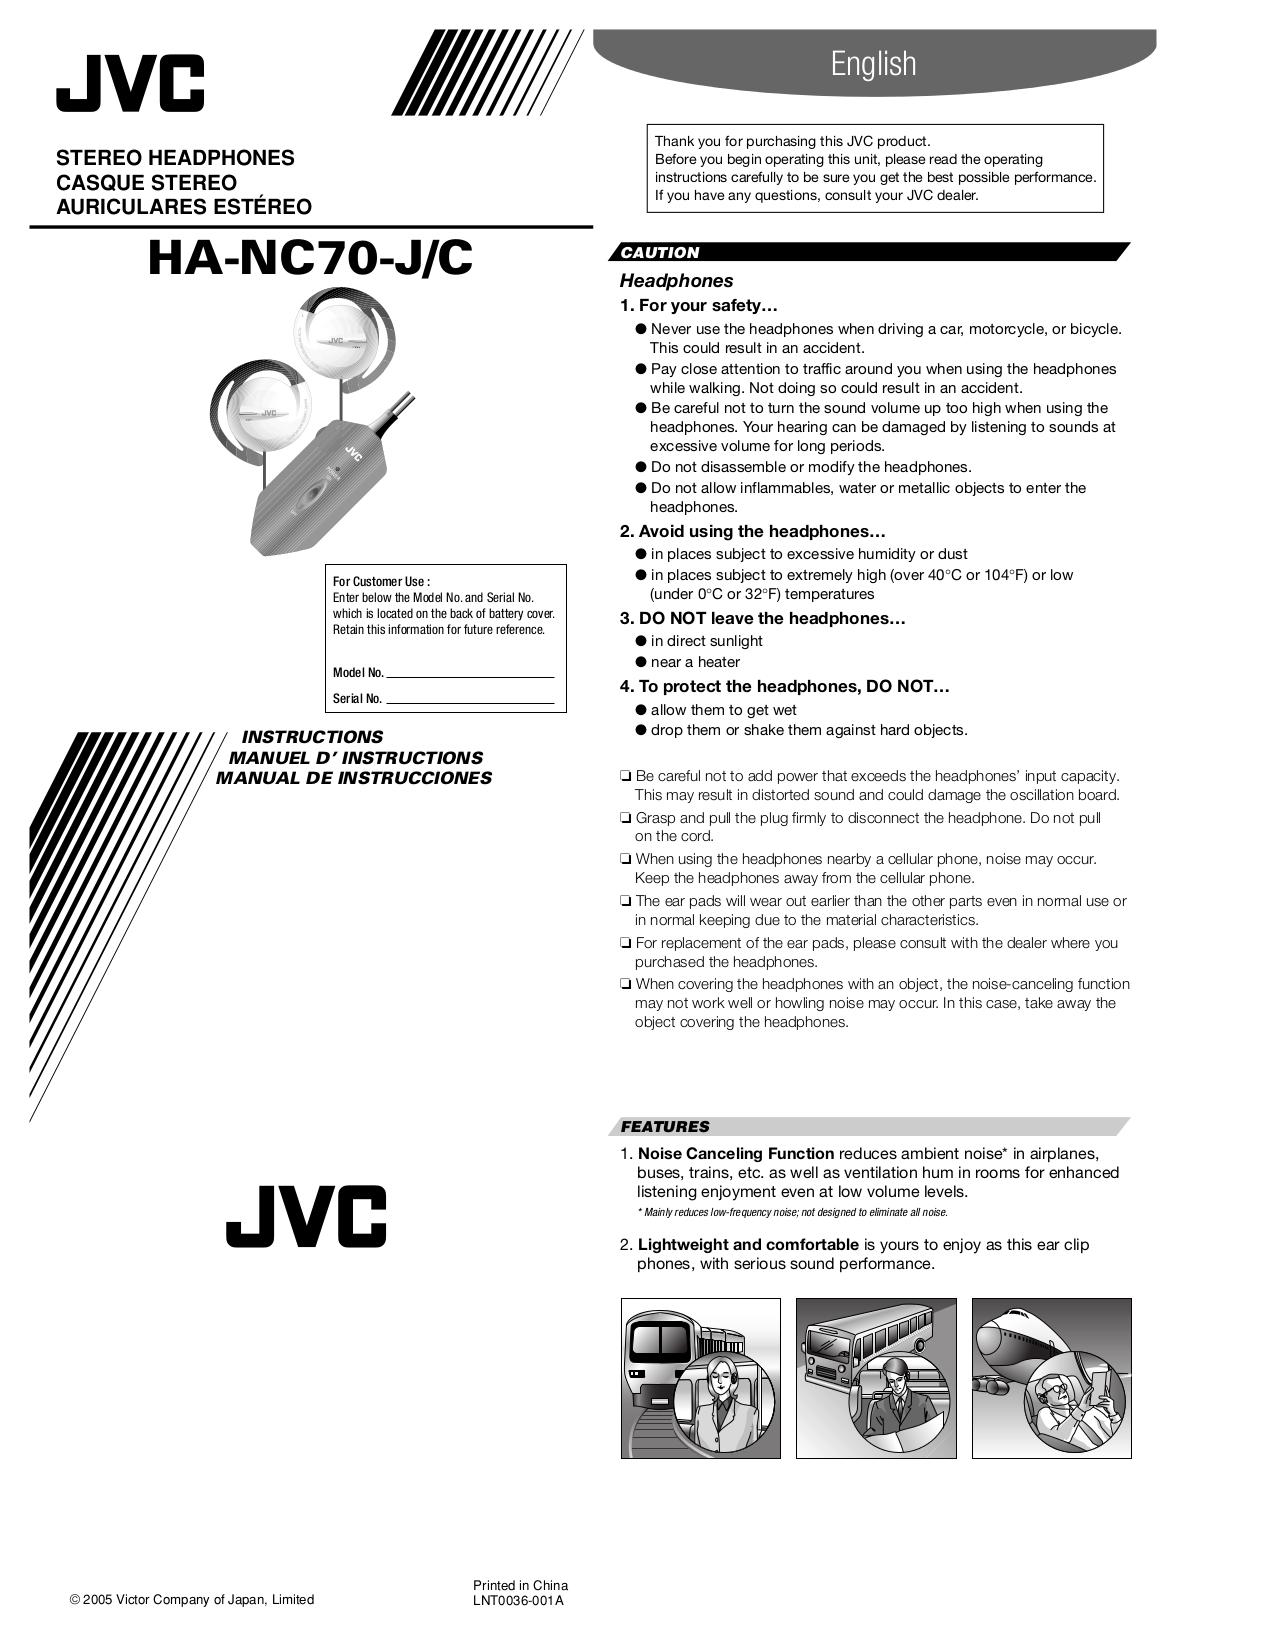 pdf for JVC Headphone HA-NC70 manual